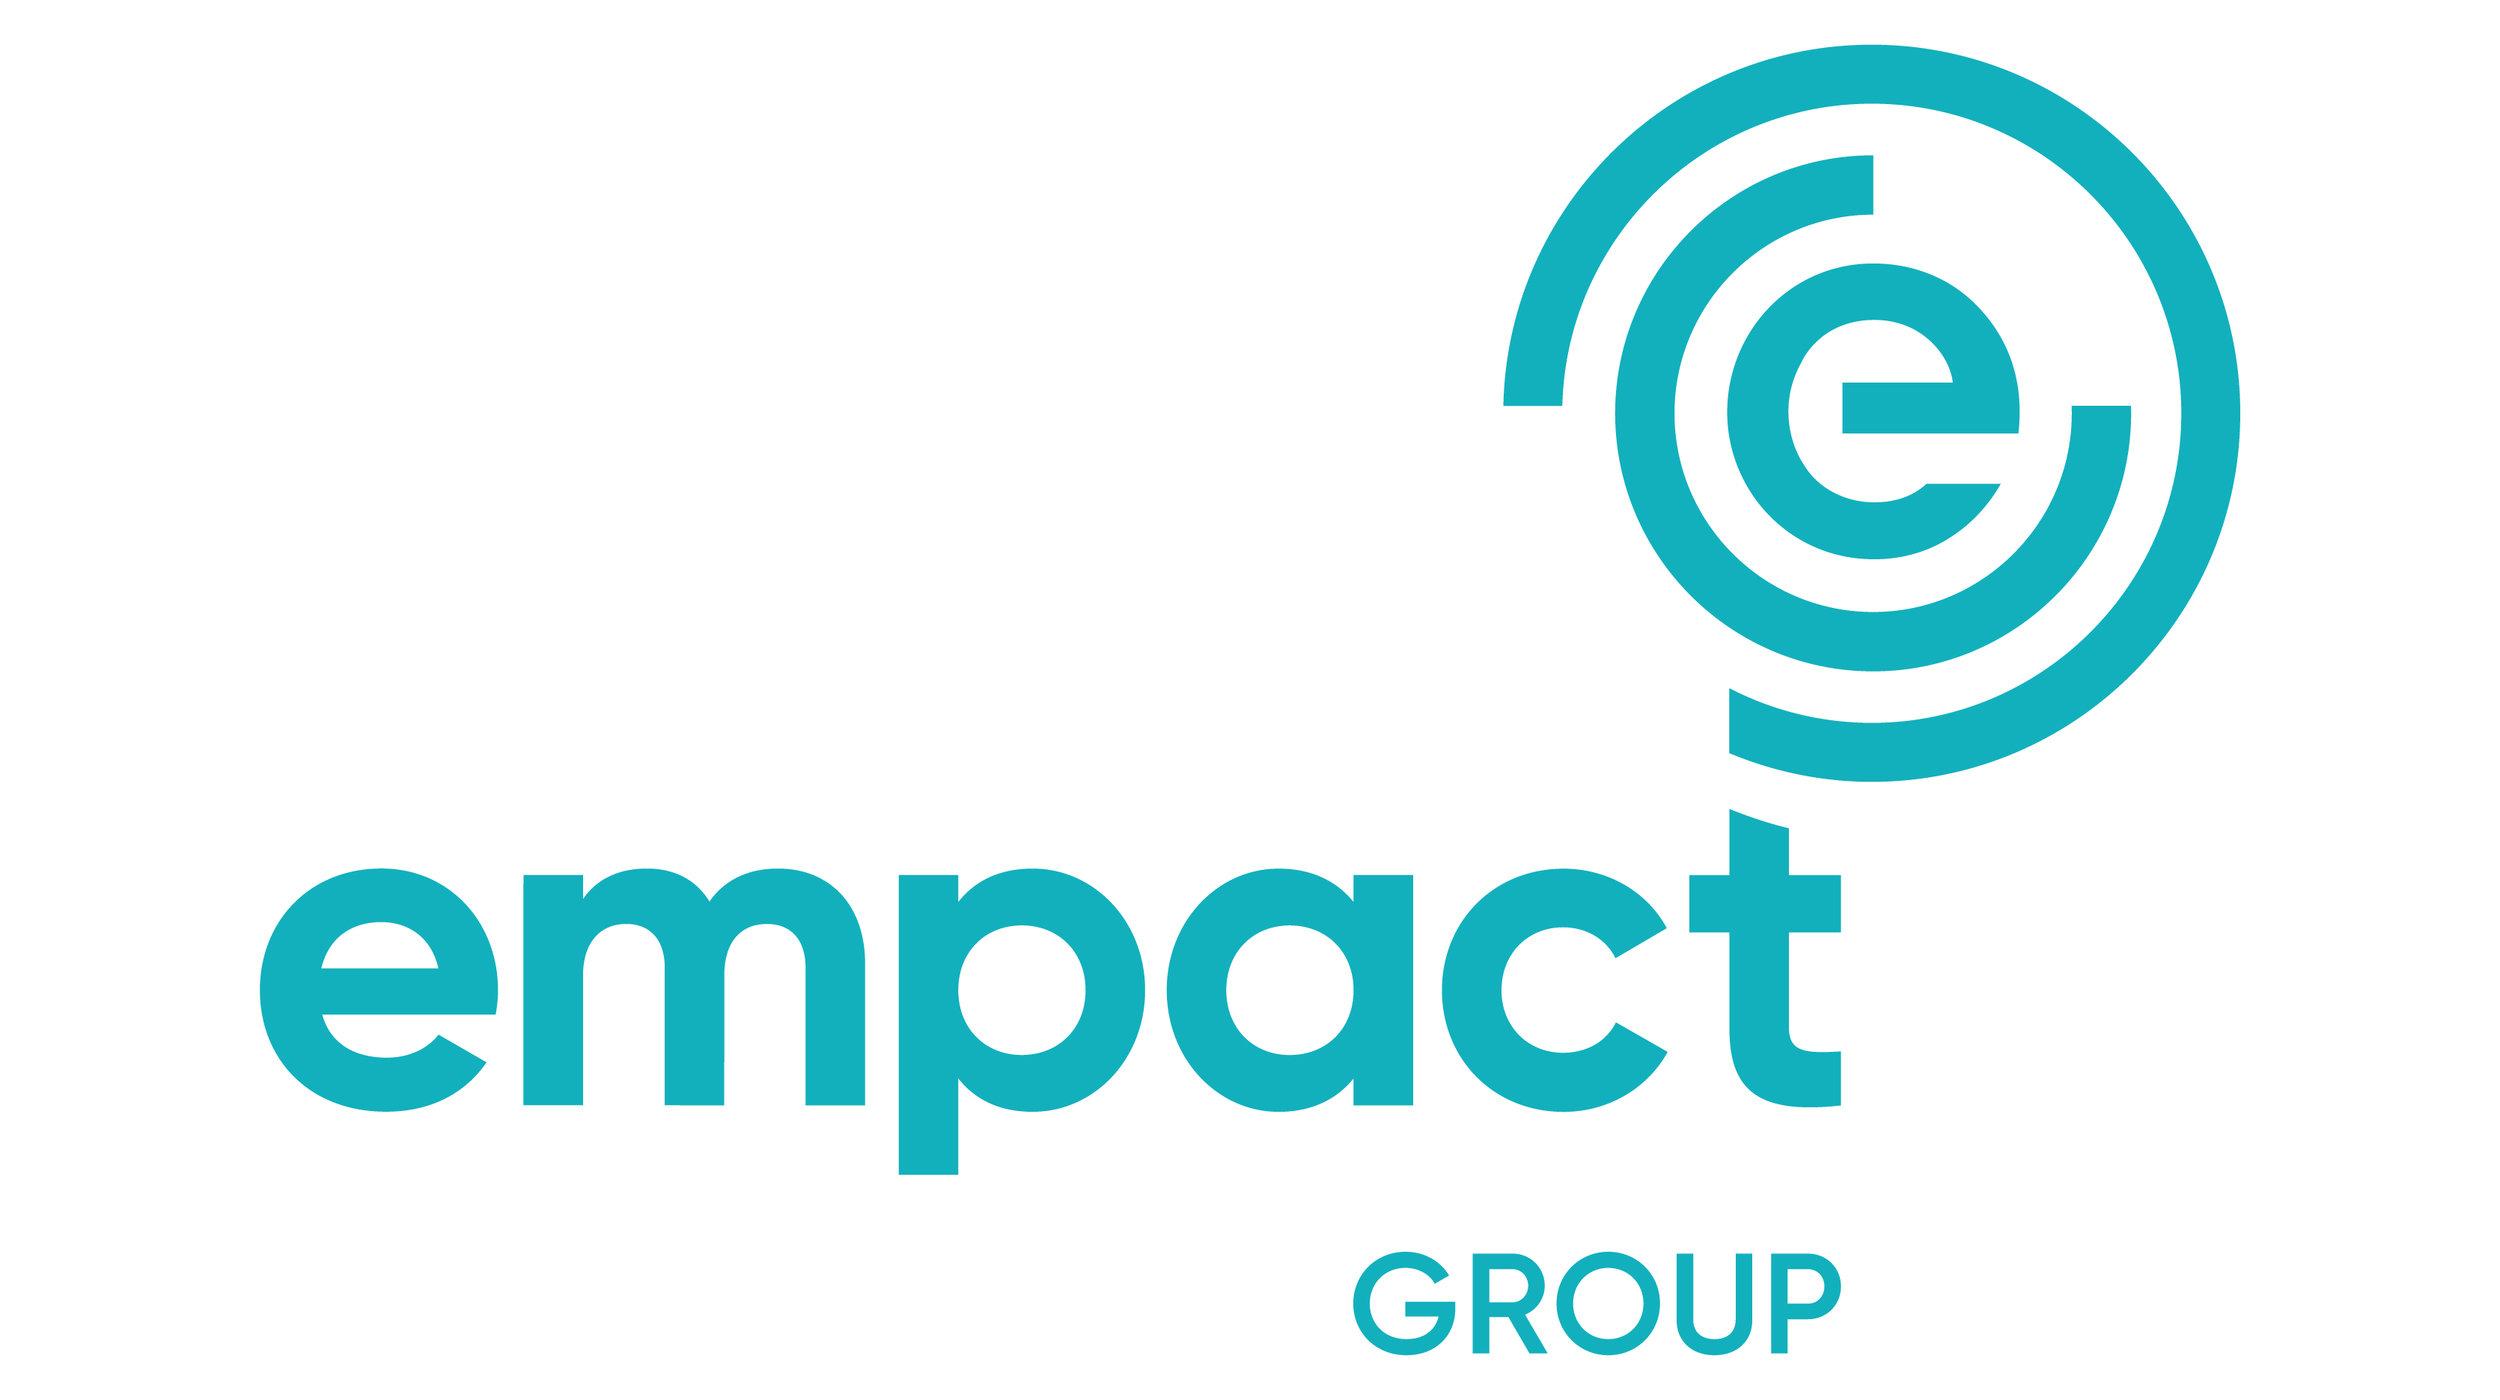 EMPACT GROUP-04.jpg